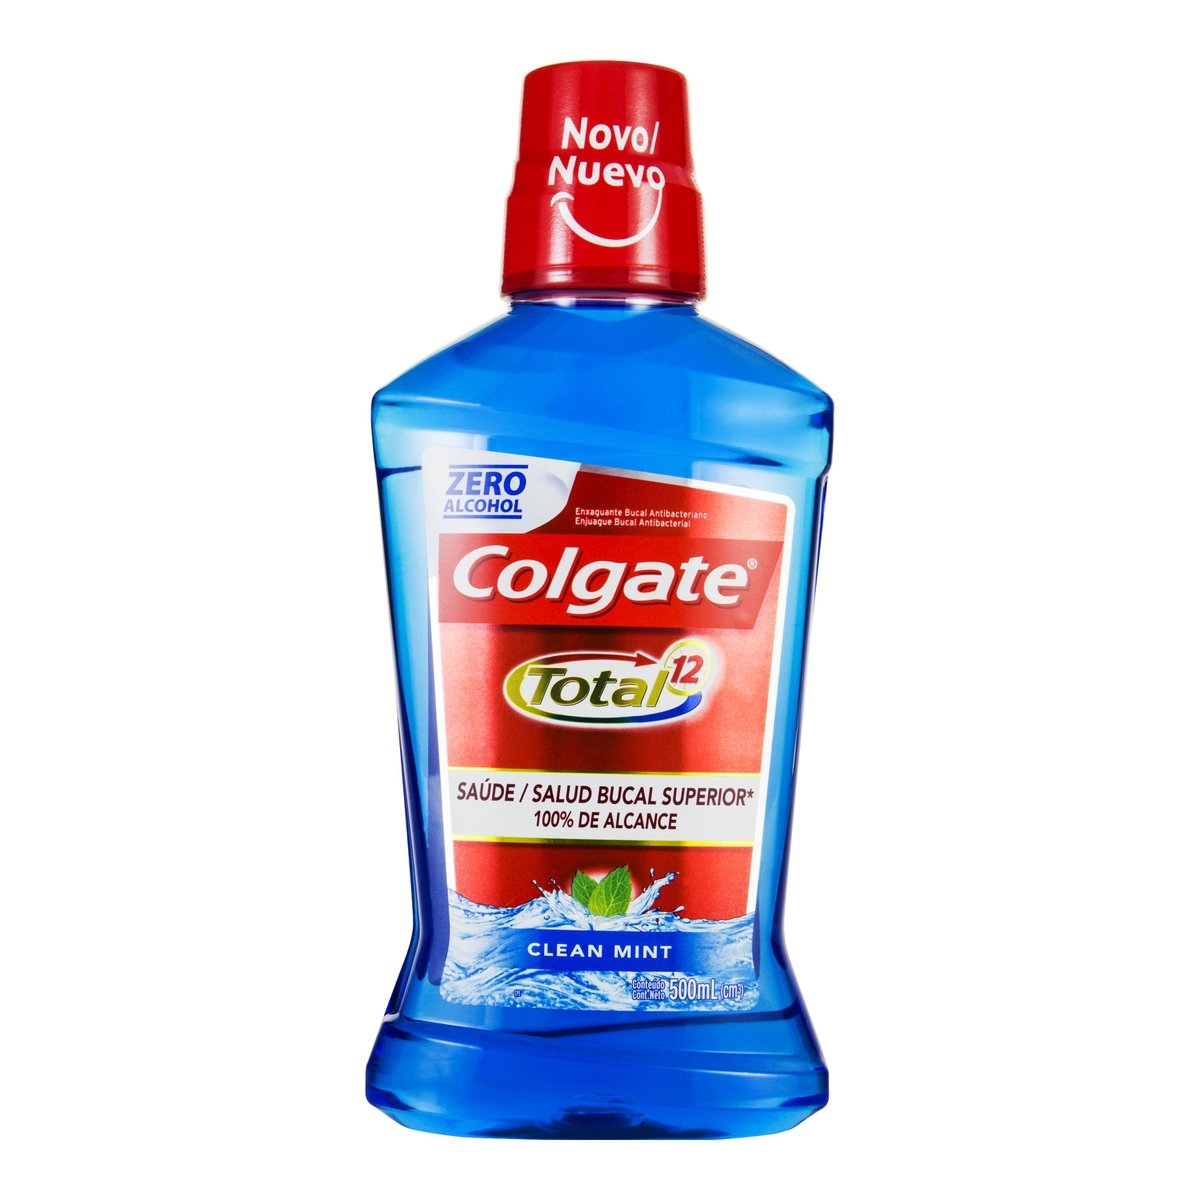 ENXAG COLG TO12 CLEAN MINT 1X500ML(12)